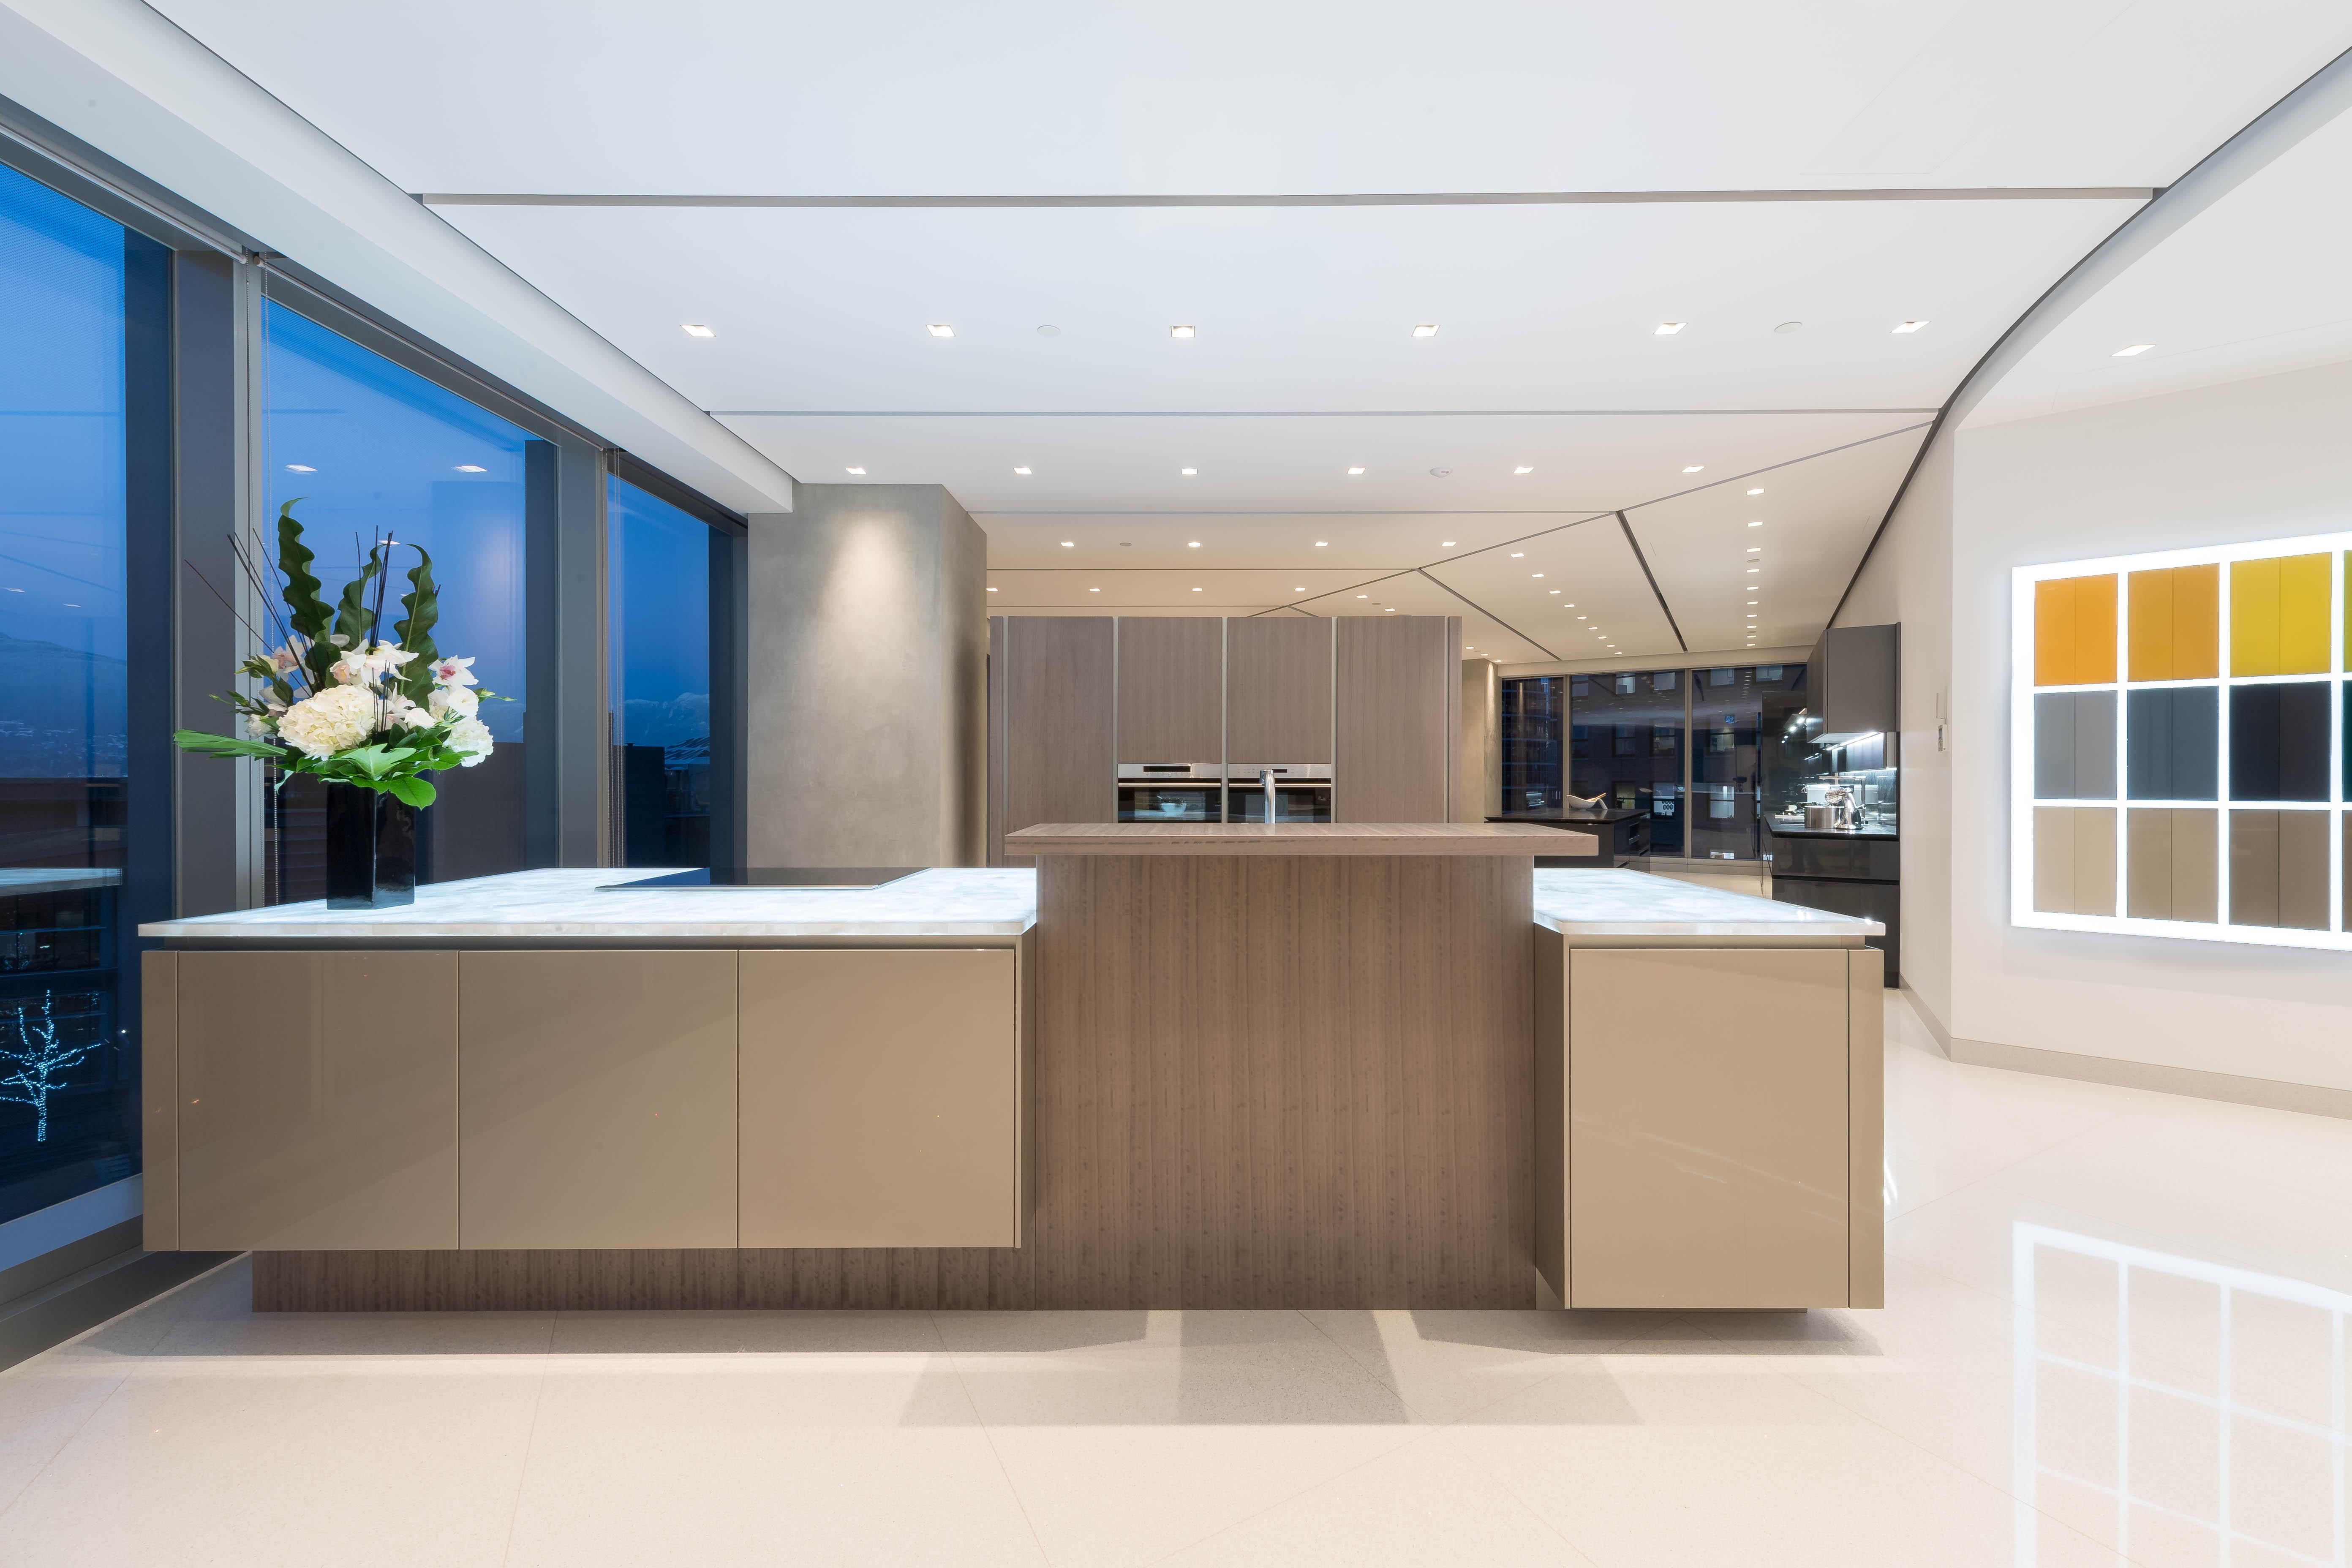 luxury kitchen showroom, studio snaidero vancouver expands to